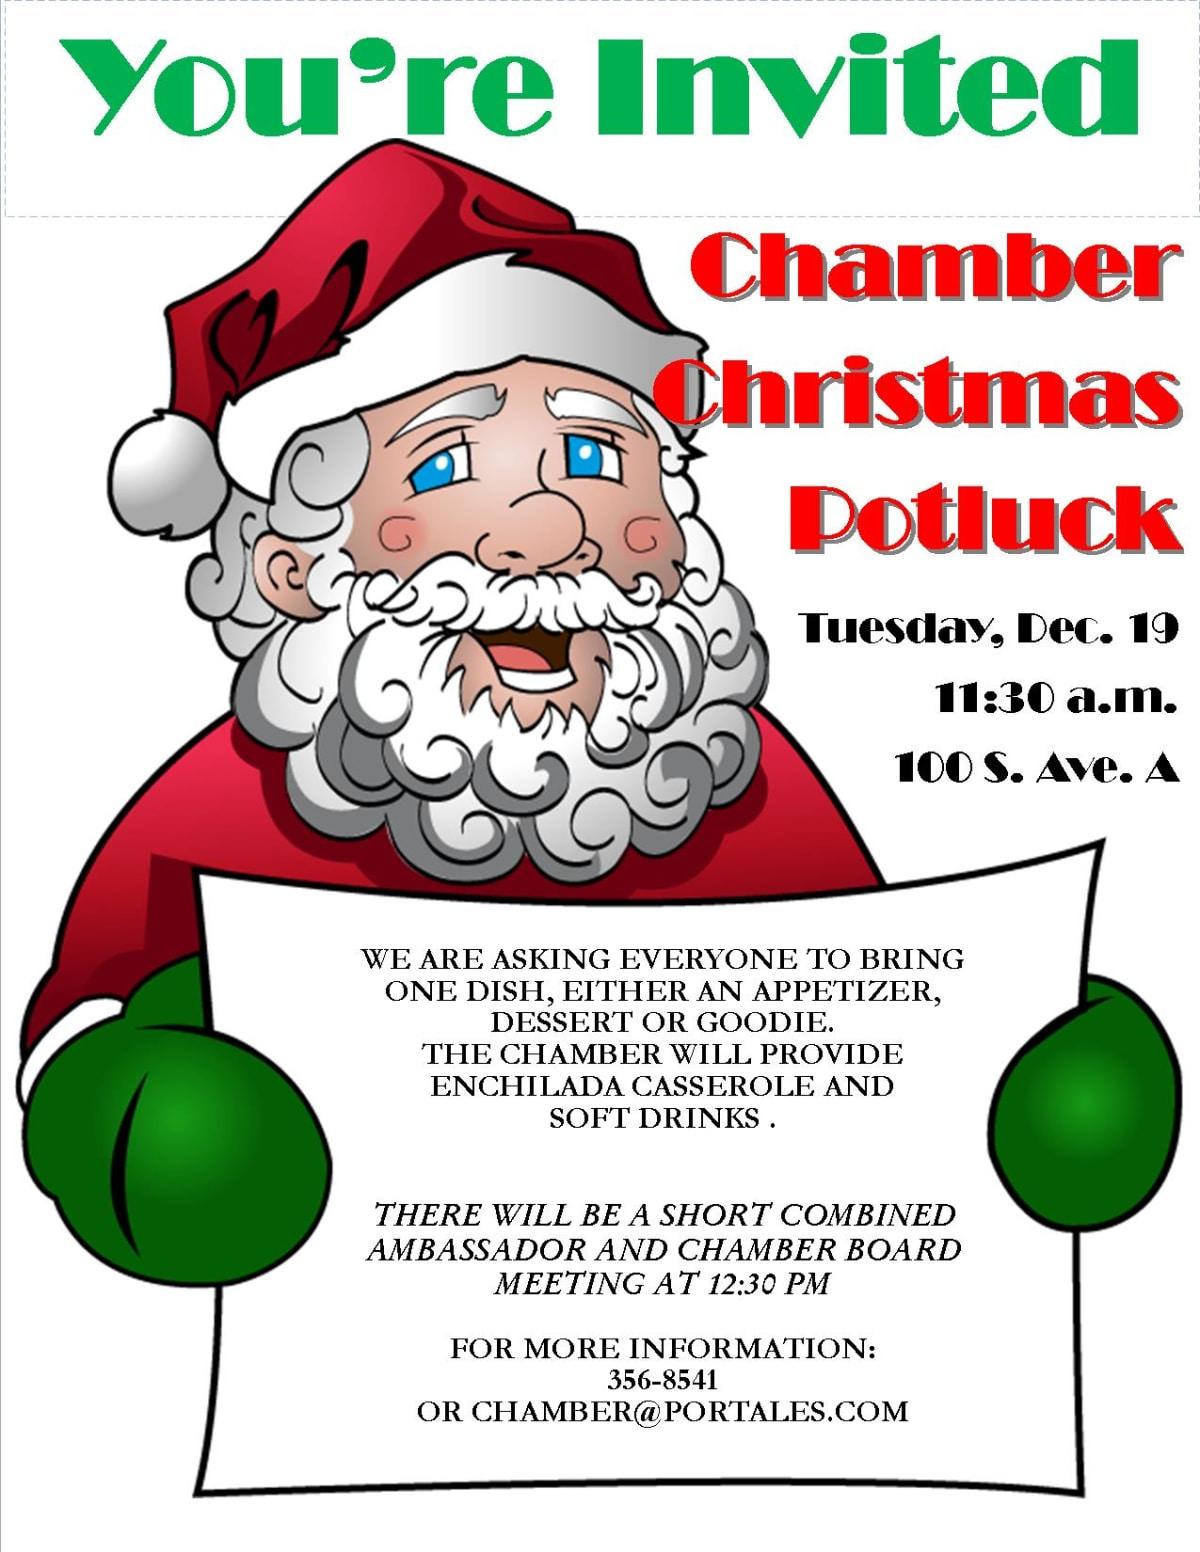 Christmas-Potluck-invite17-w1200.jpg